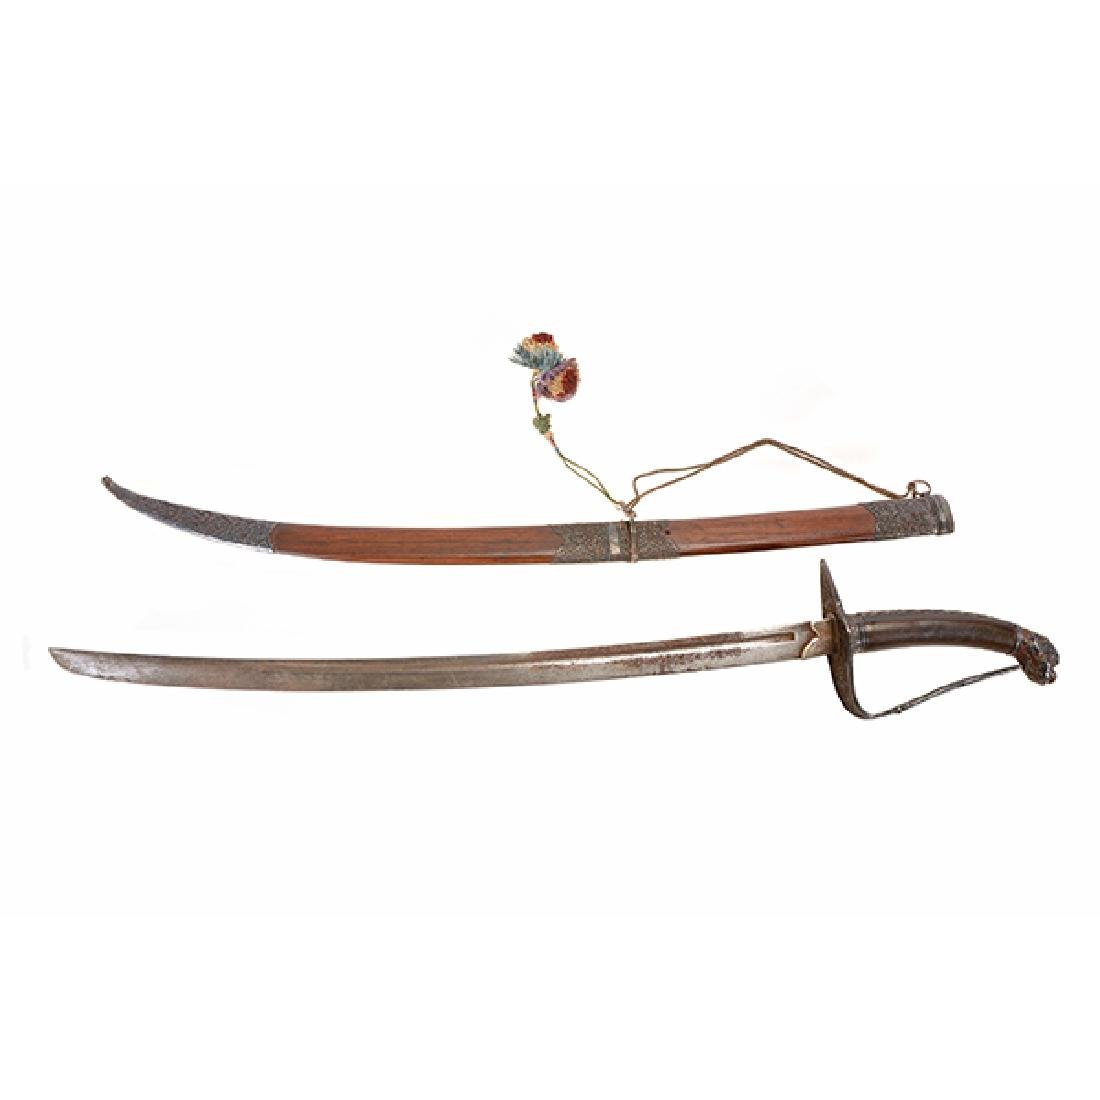 A Tibetan Ceremonial Sword, 19th Century